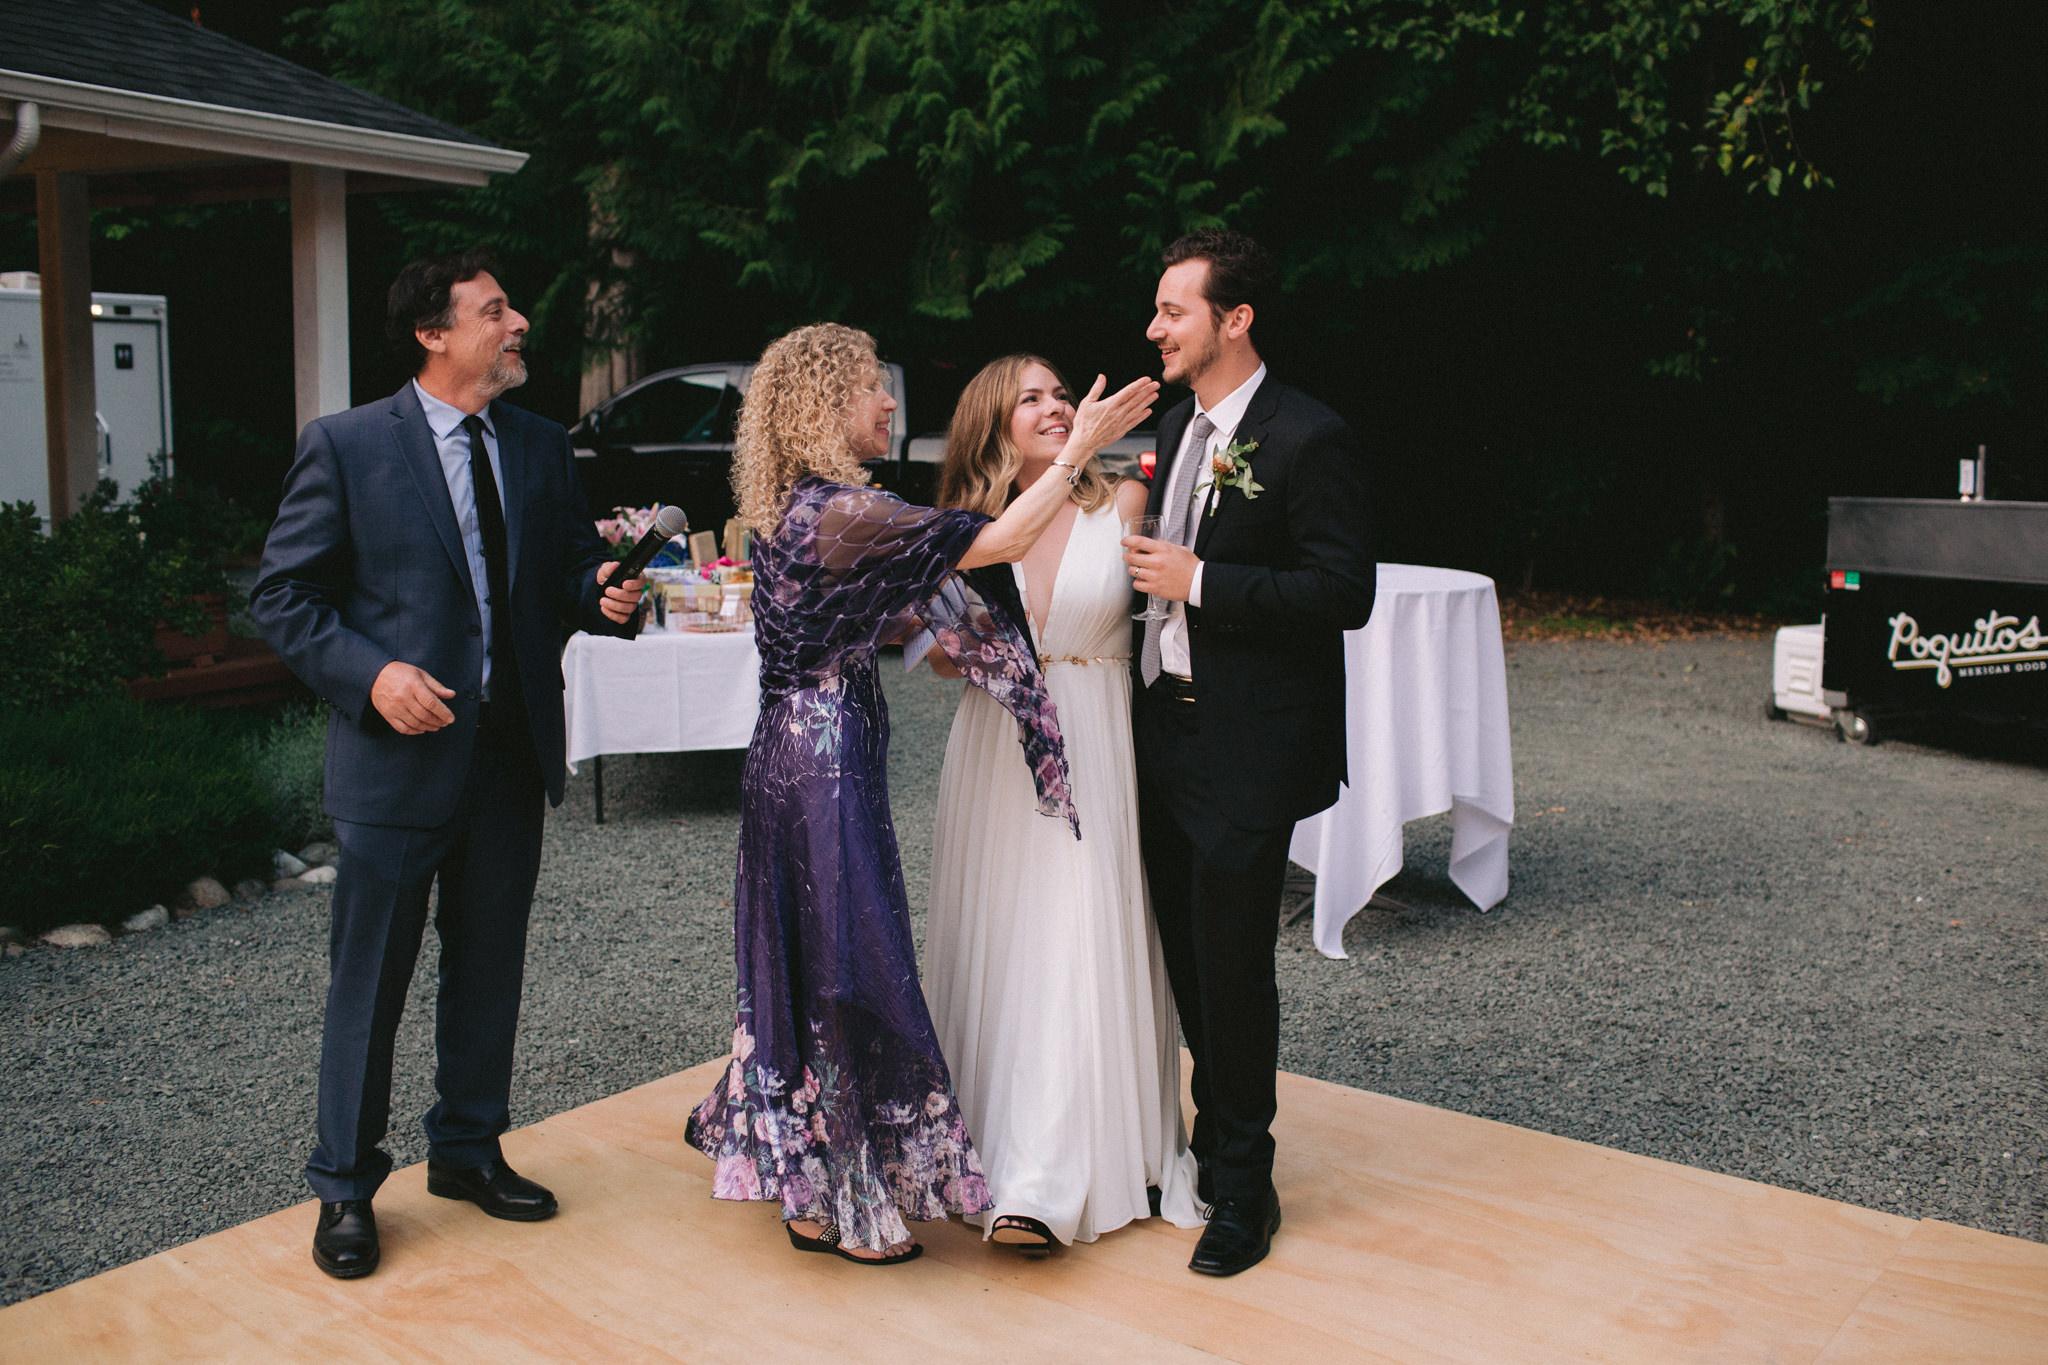 Backyard-Bainbridge-Island-Wedding-Alycia-Lovell-Photography-188.JPG